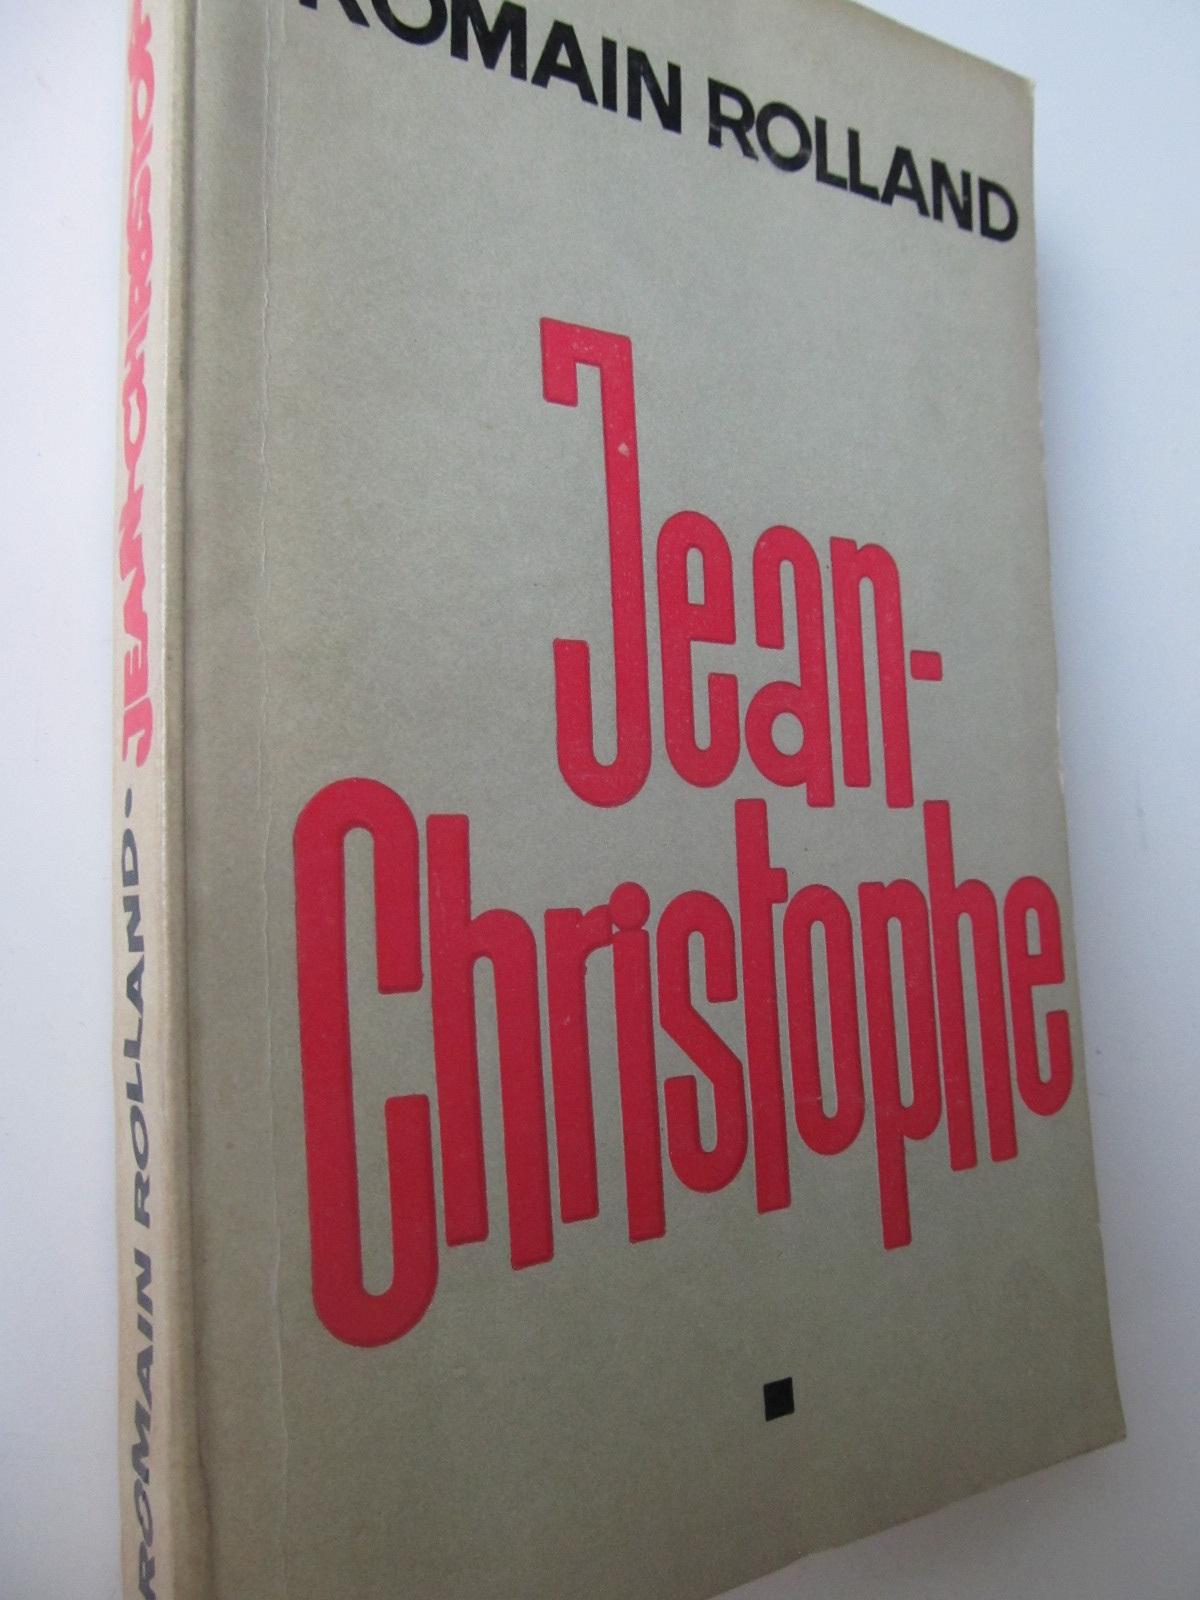 Jean Christophe (vol. 1) - Romain Rolland | Detalii carte